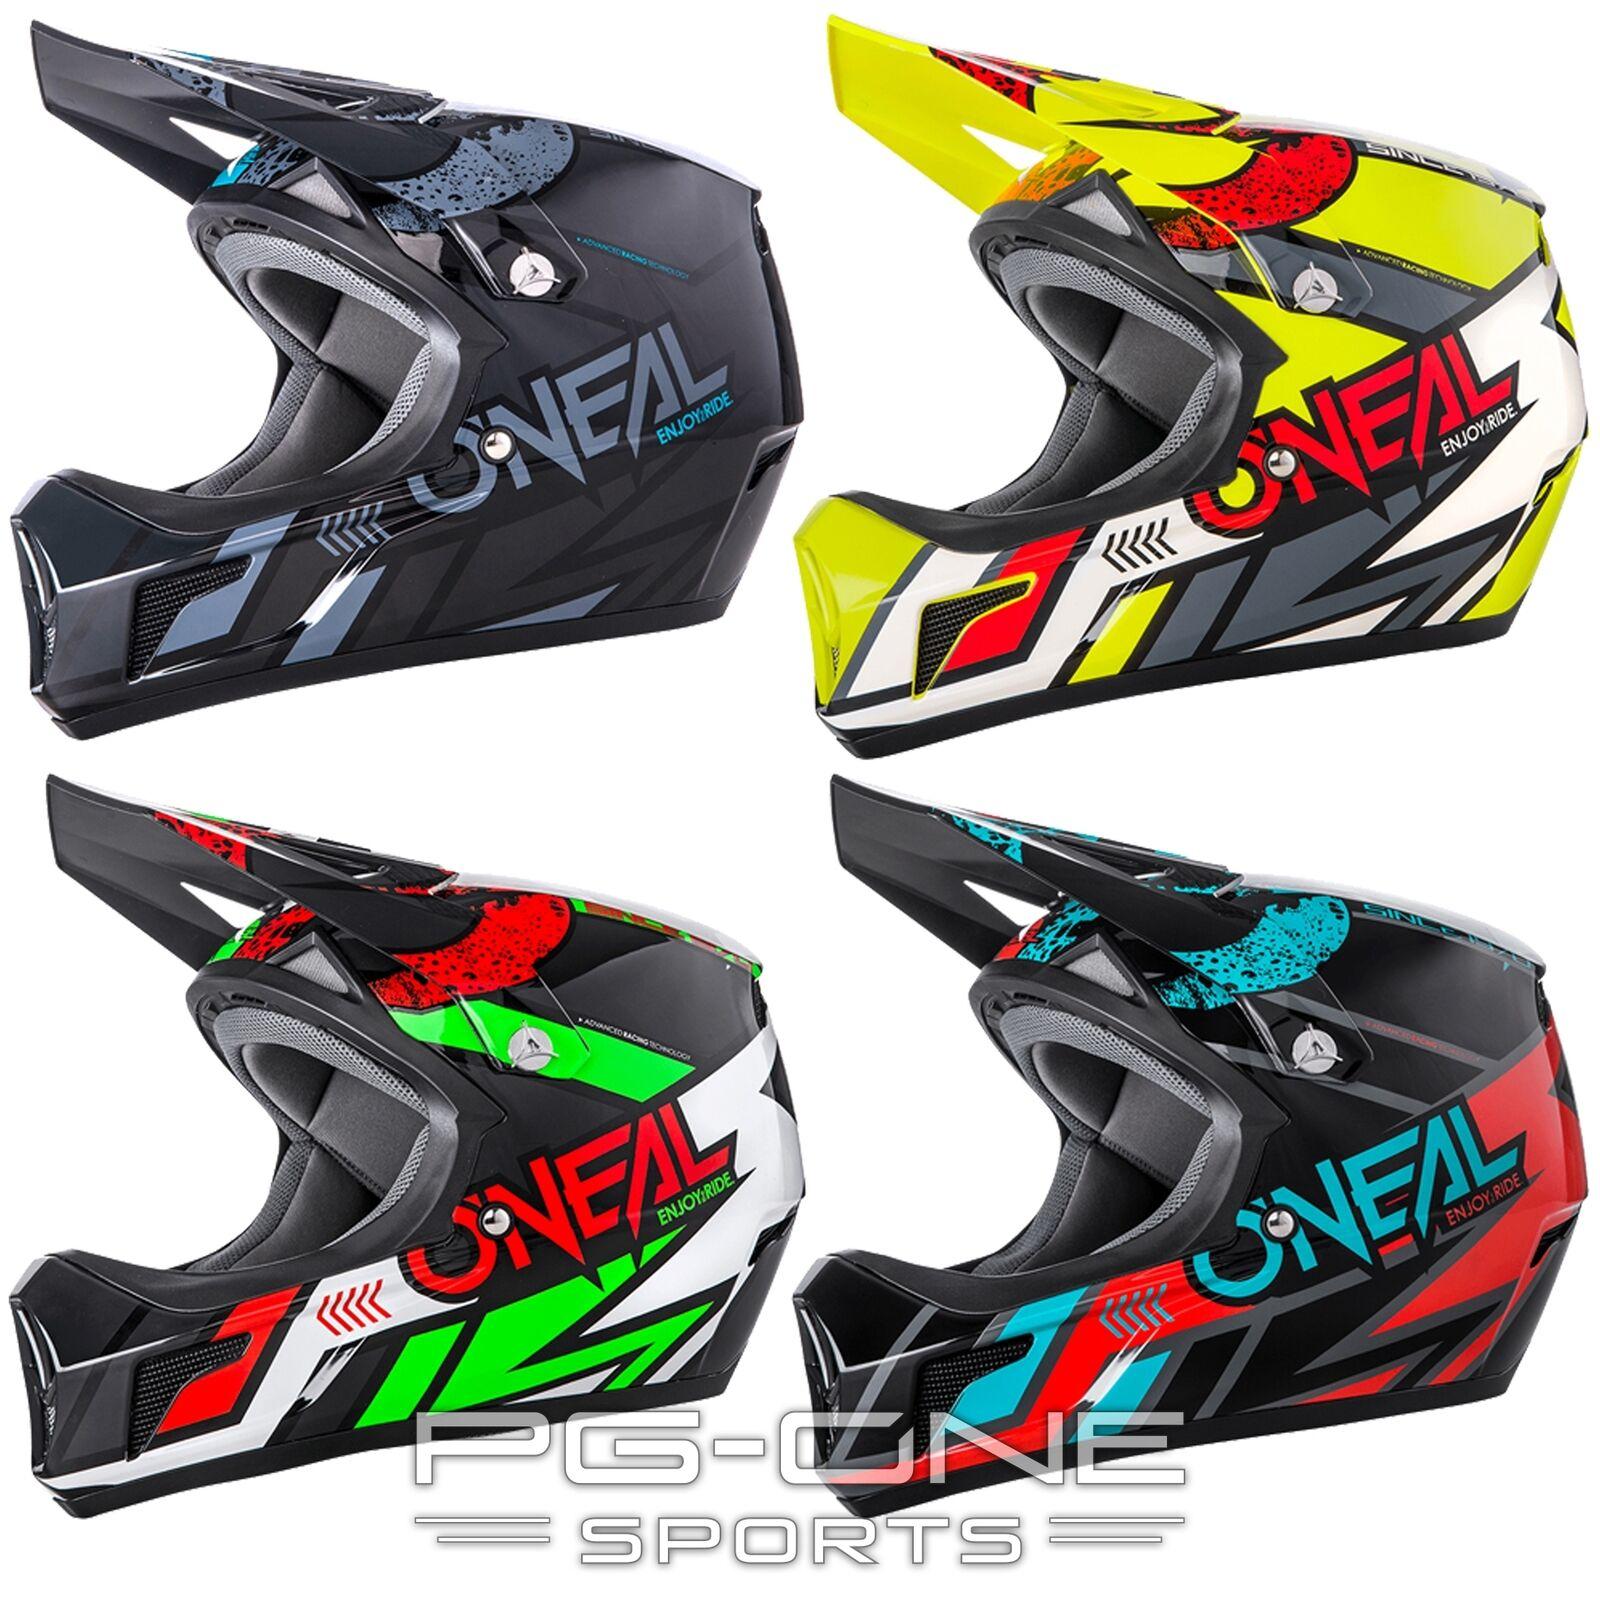 ONEAL Sonus Downhill Helmet-Enduro Helmet-Cycling Helmet-nouveau